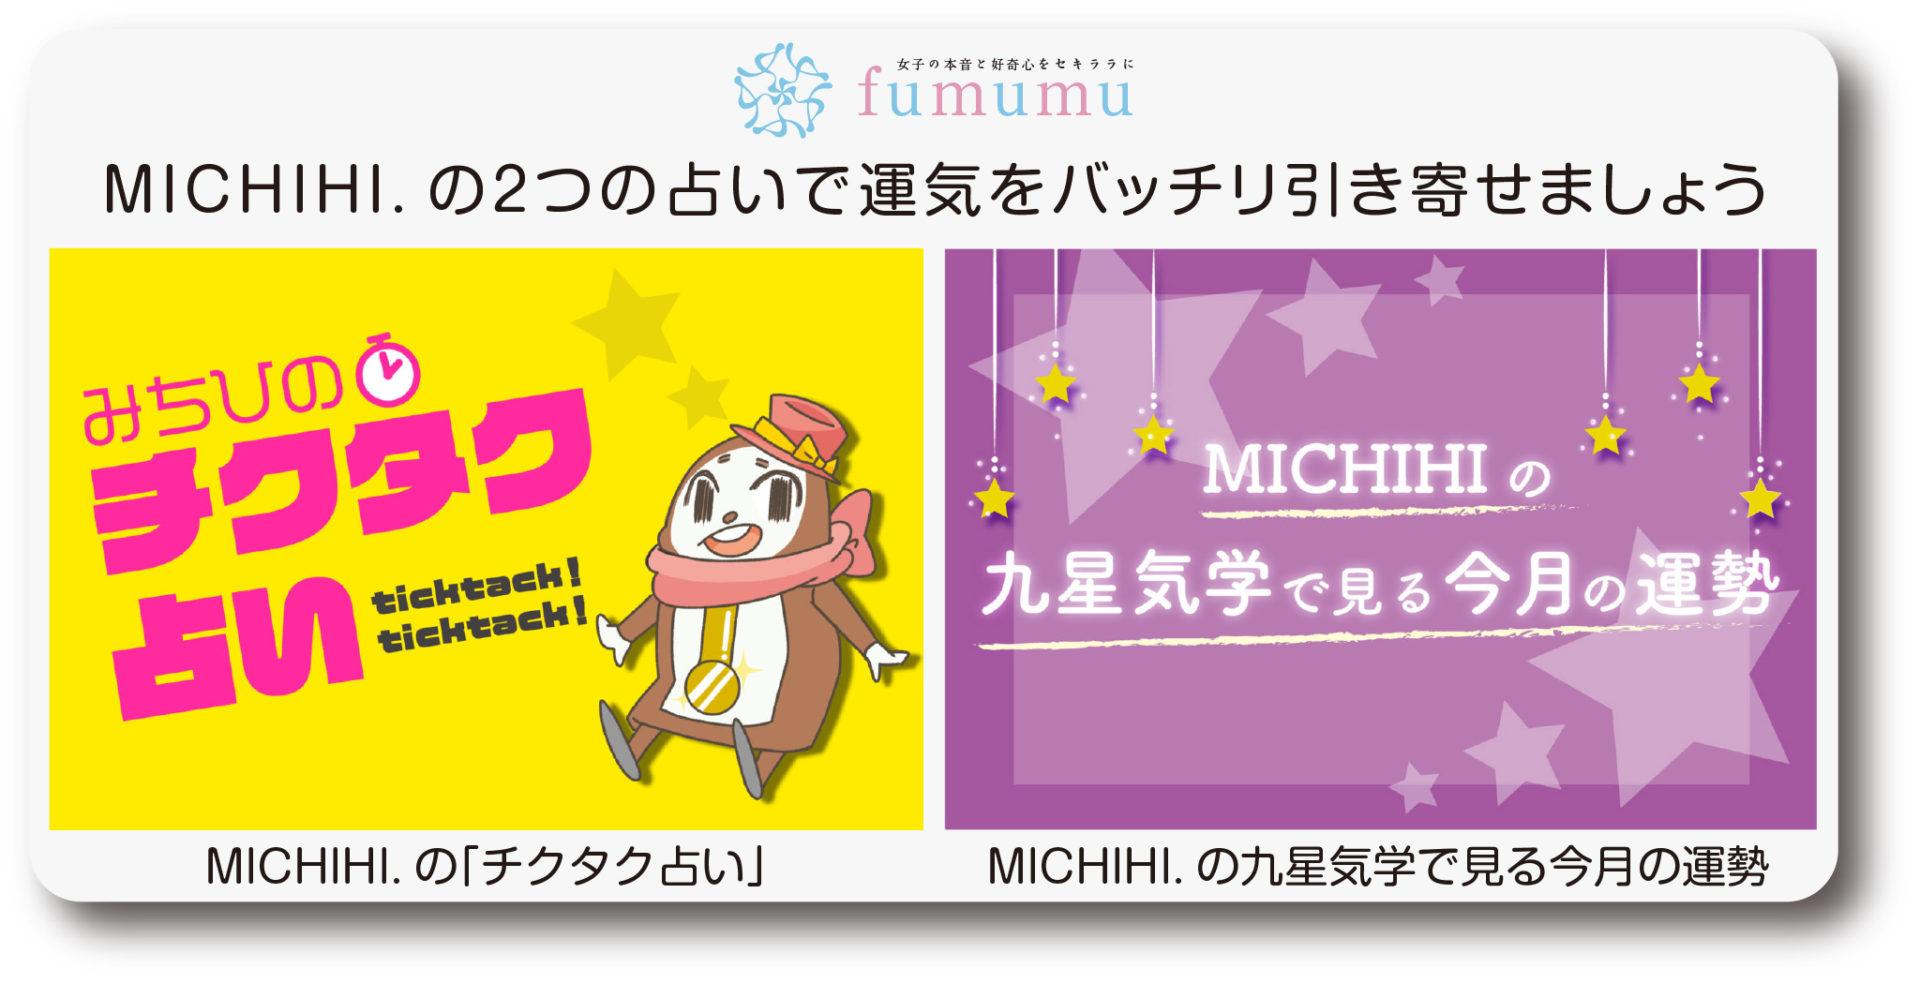 MICHIHI,チクタク占い、九星気学